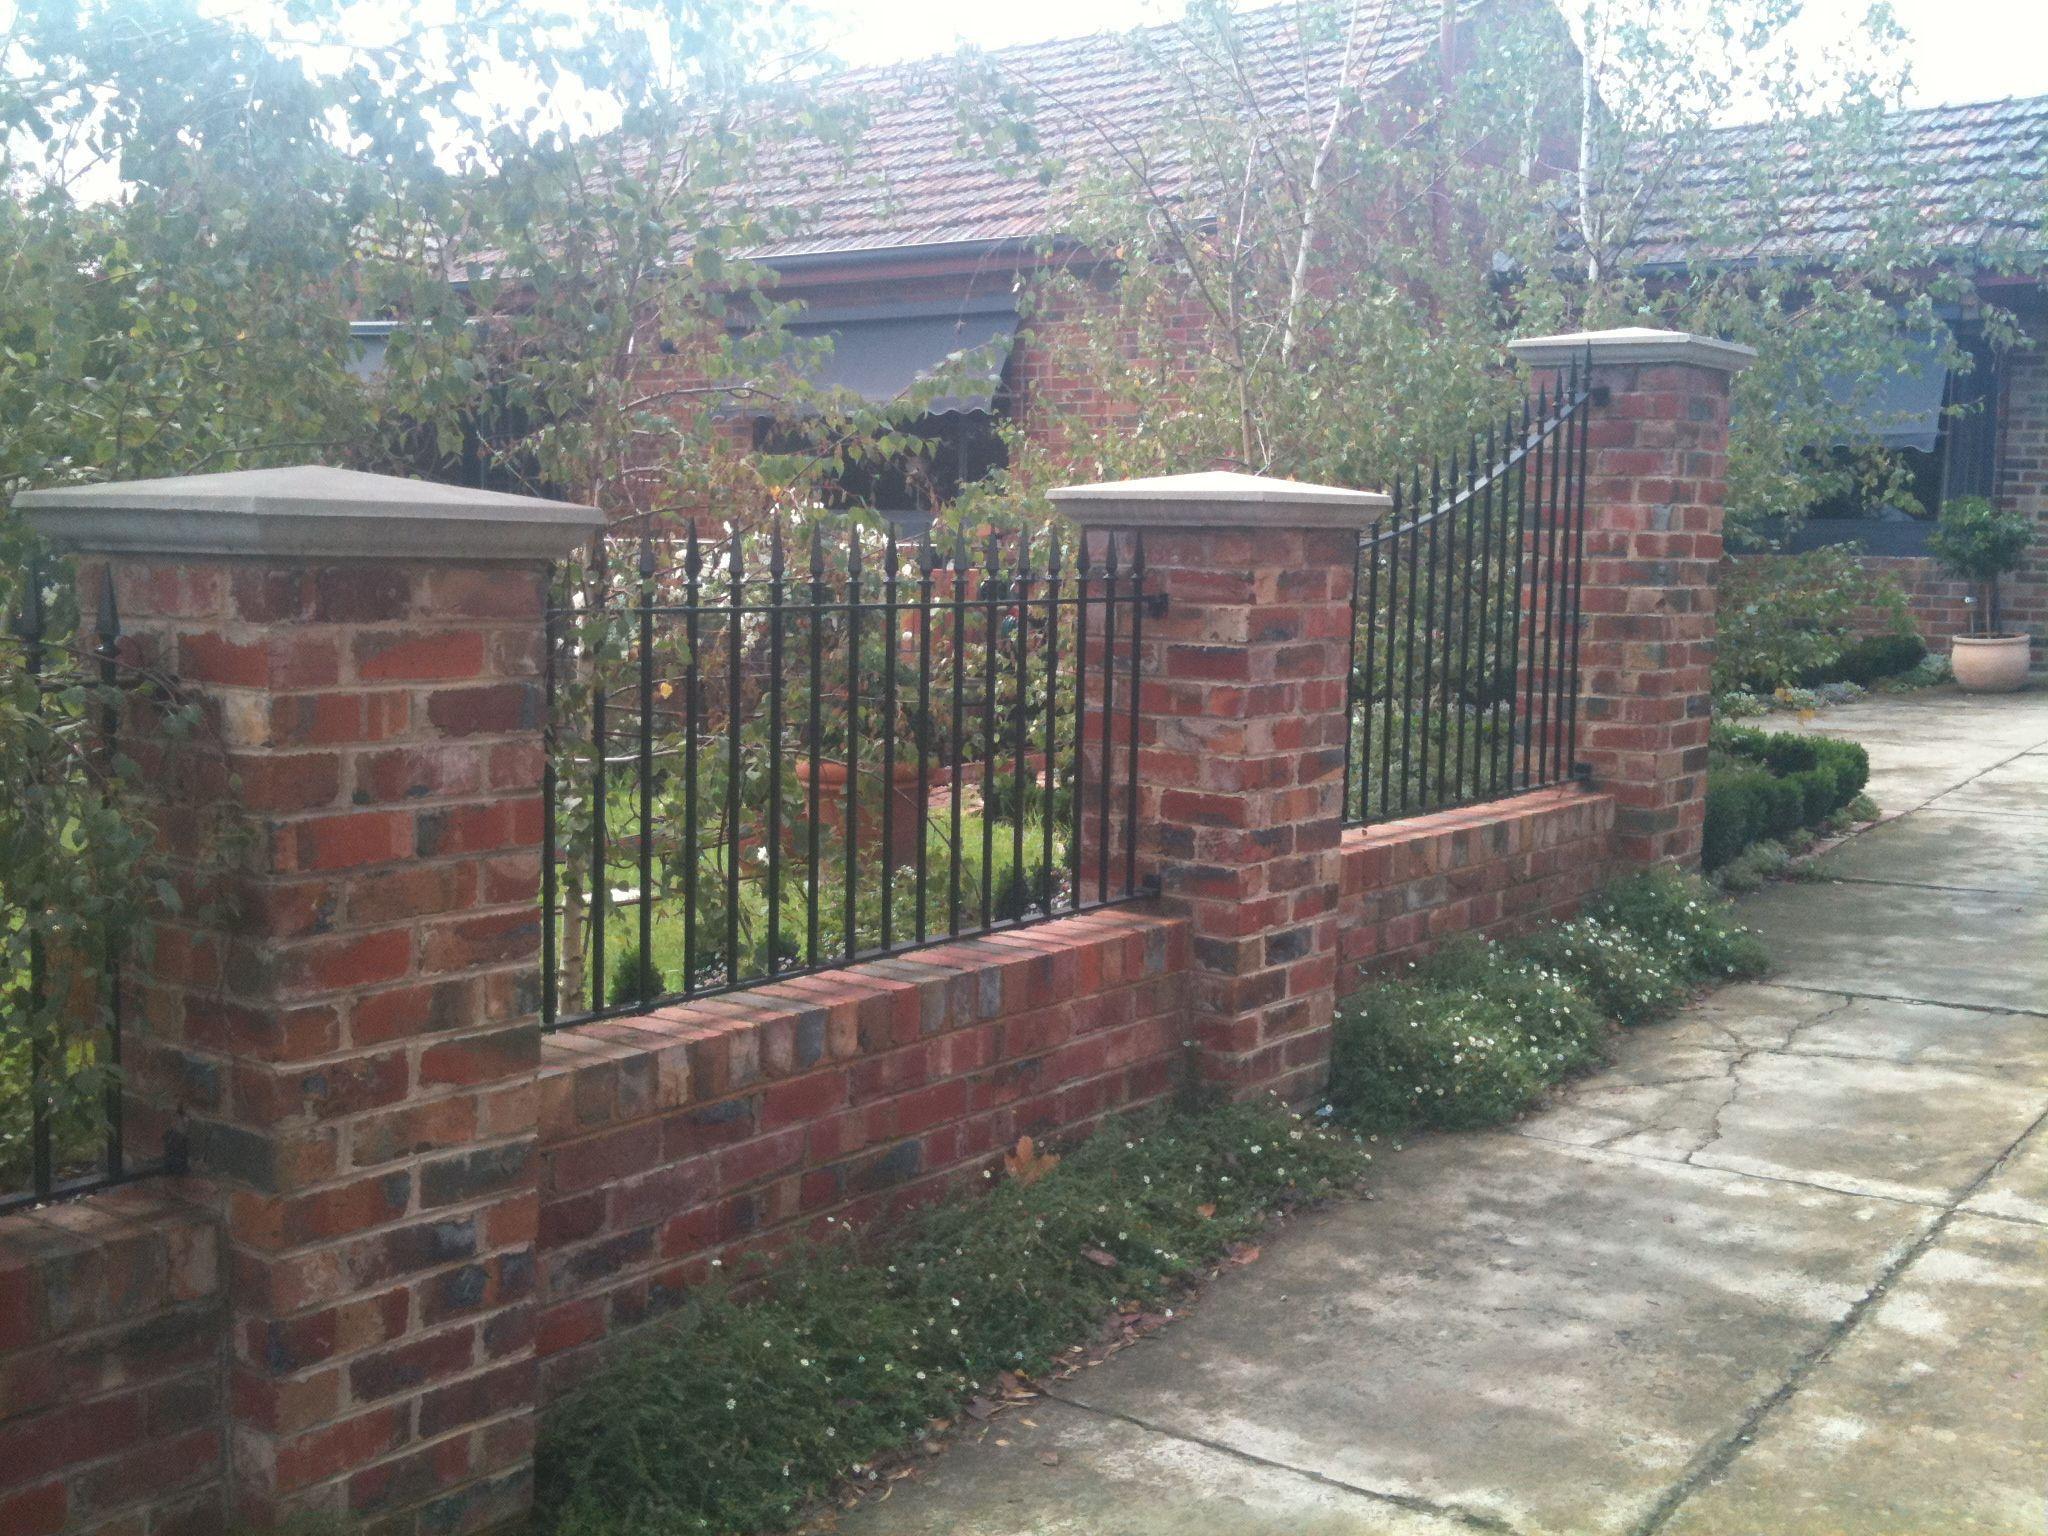 Brick And Iron Fence Ideas Google Search Iron Fence Backyard Fences Brick Fence